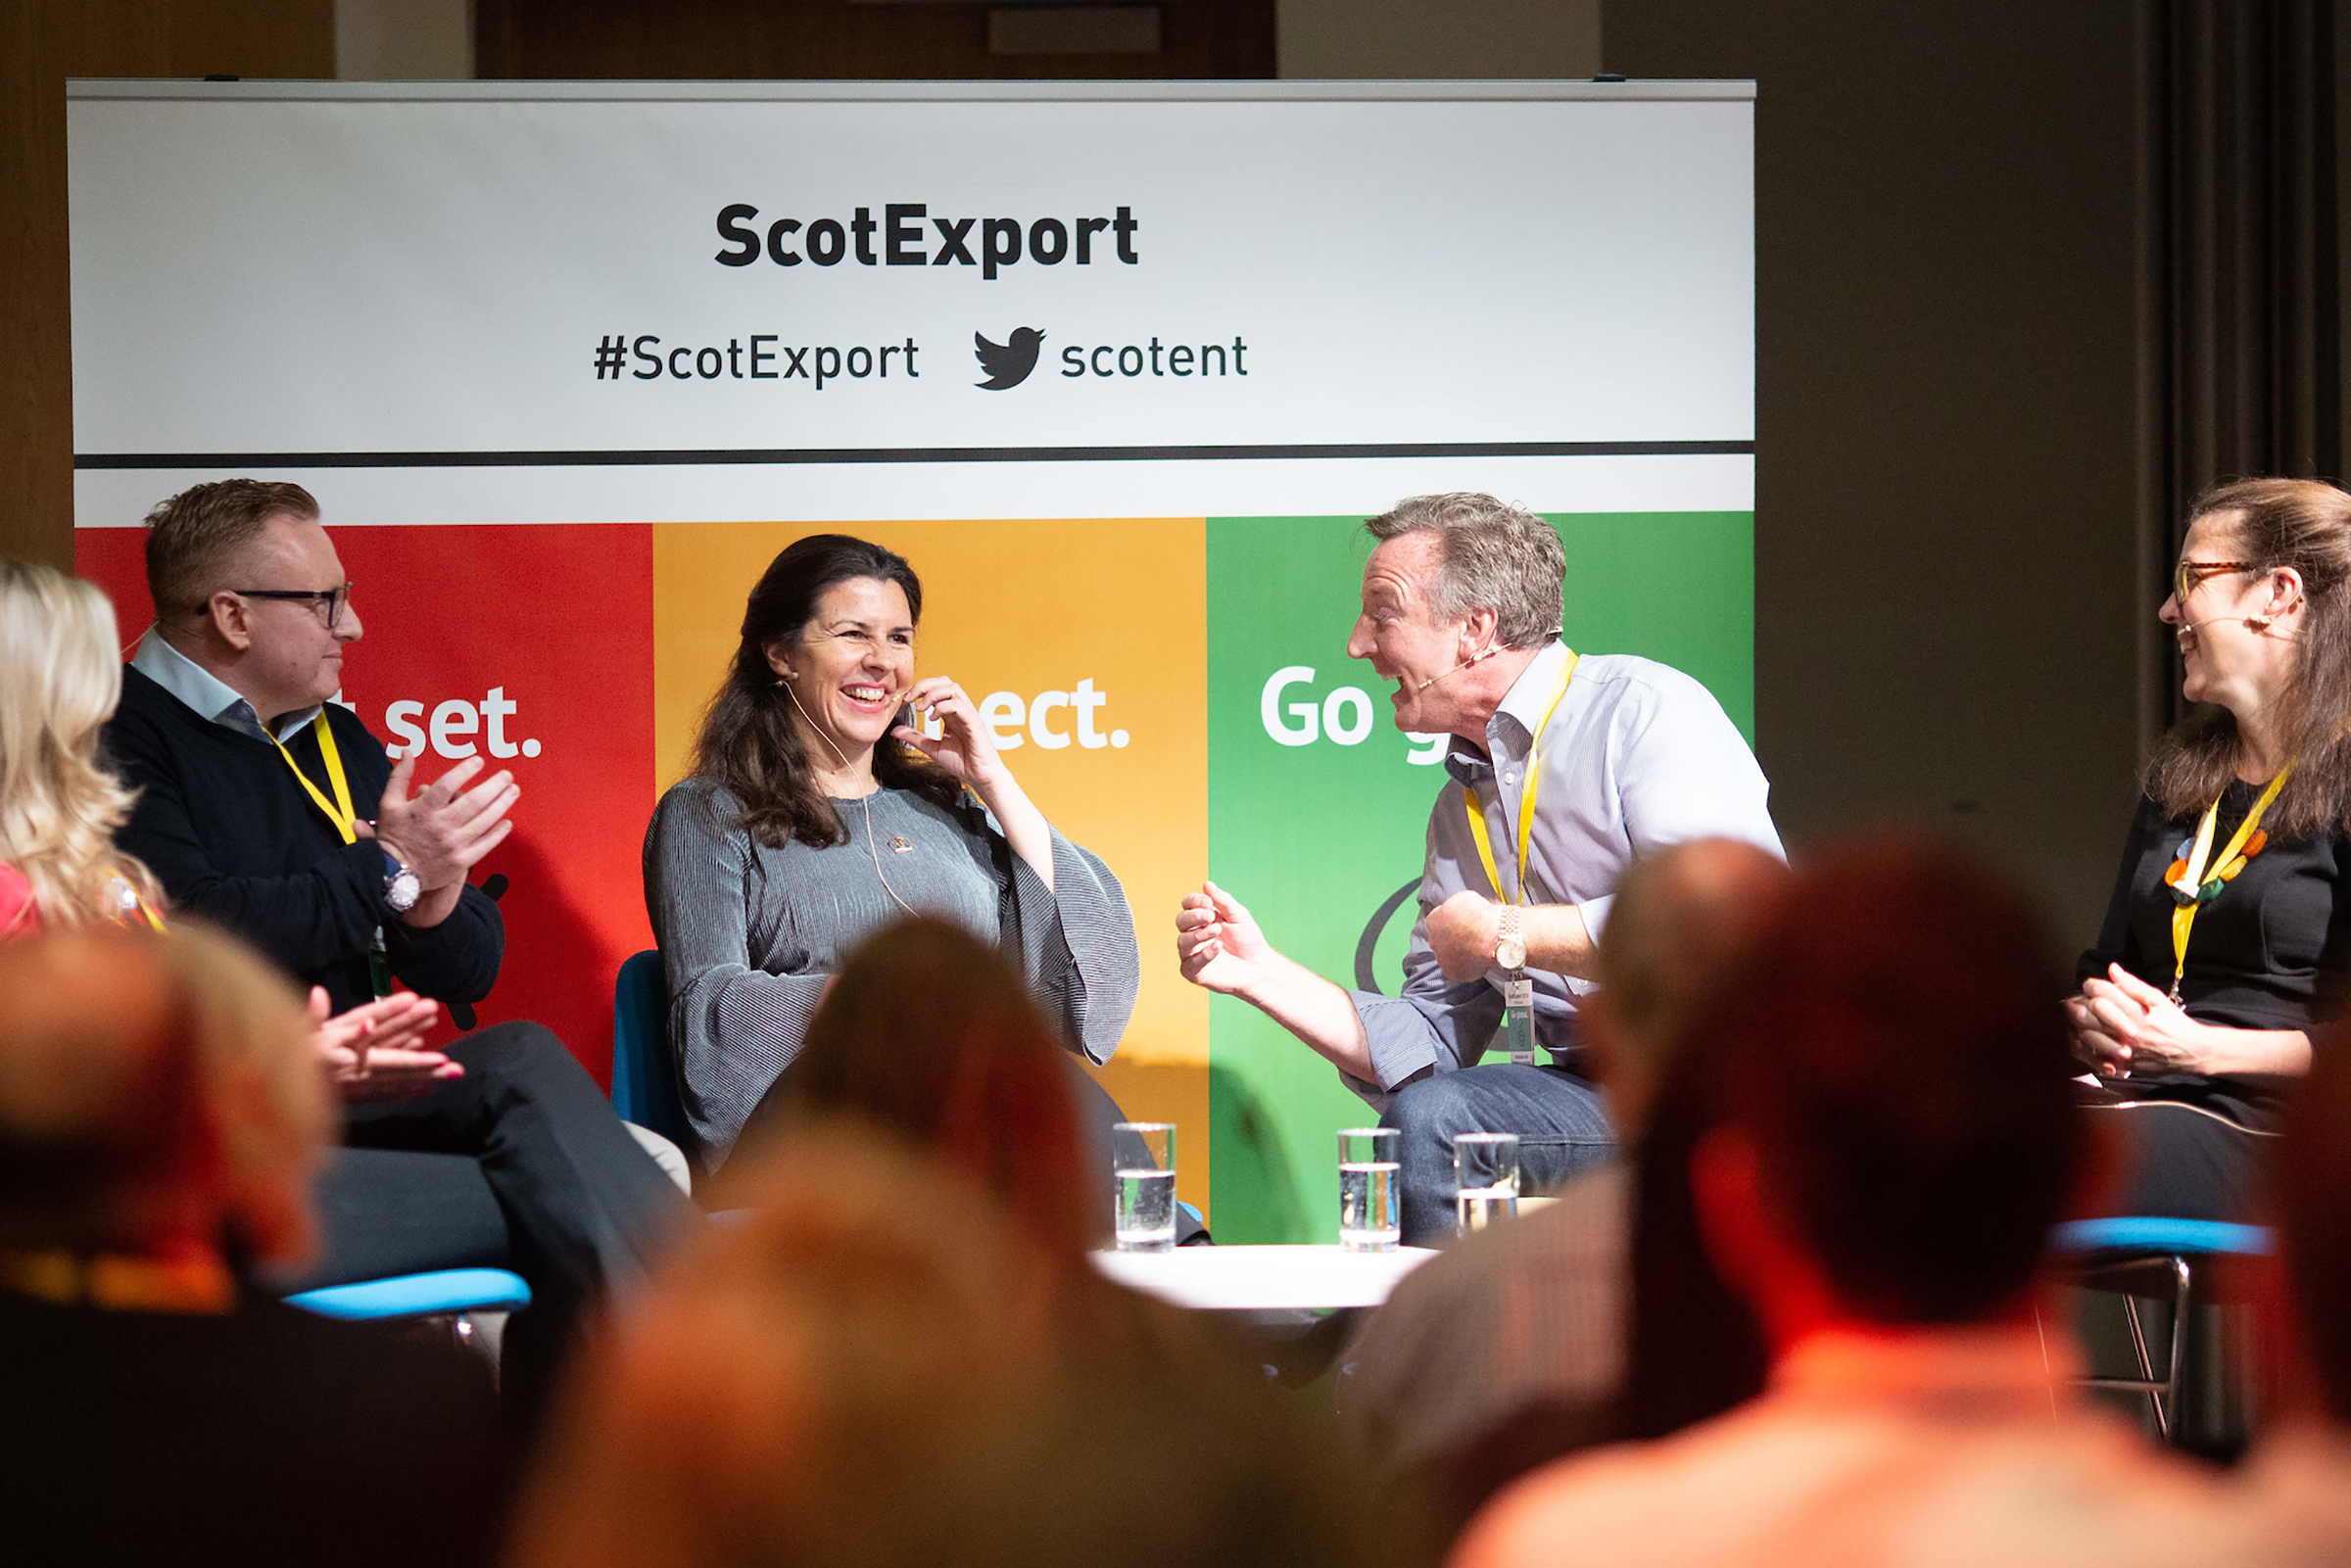 Business event - ScotExport 2019 - 12 November in Glasgow